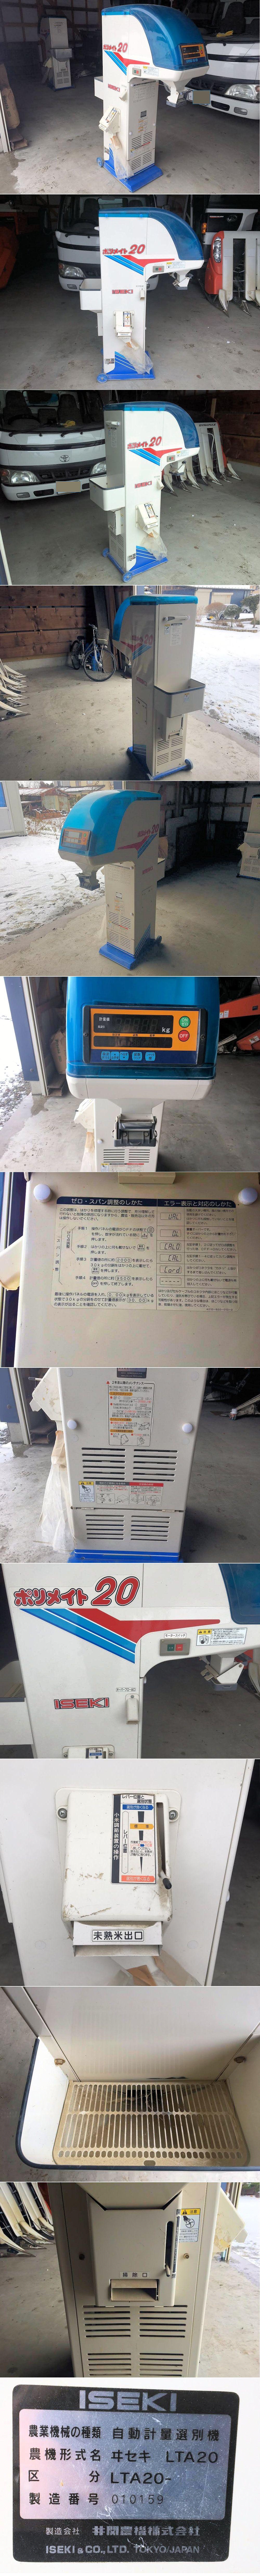 ISEKI イセキ ポリメイト20 LTA20 自動計量選別機 計り 網等 付属品 全セット 実働品 美品中古